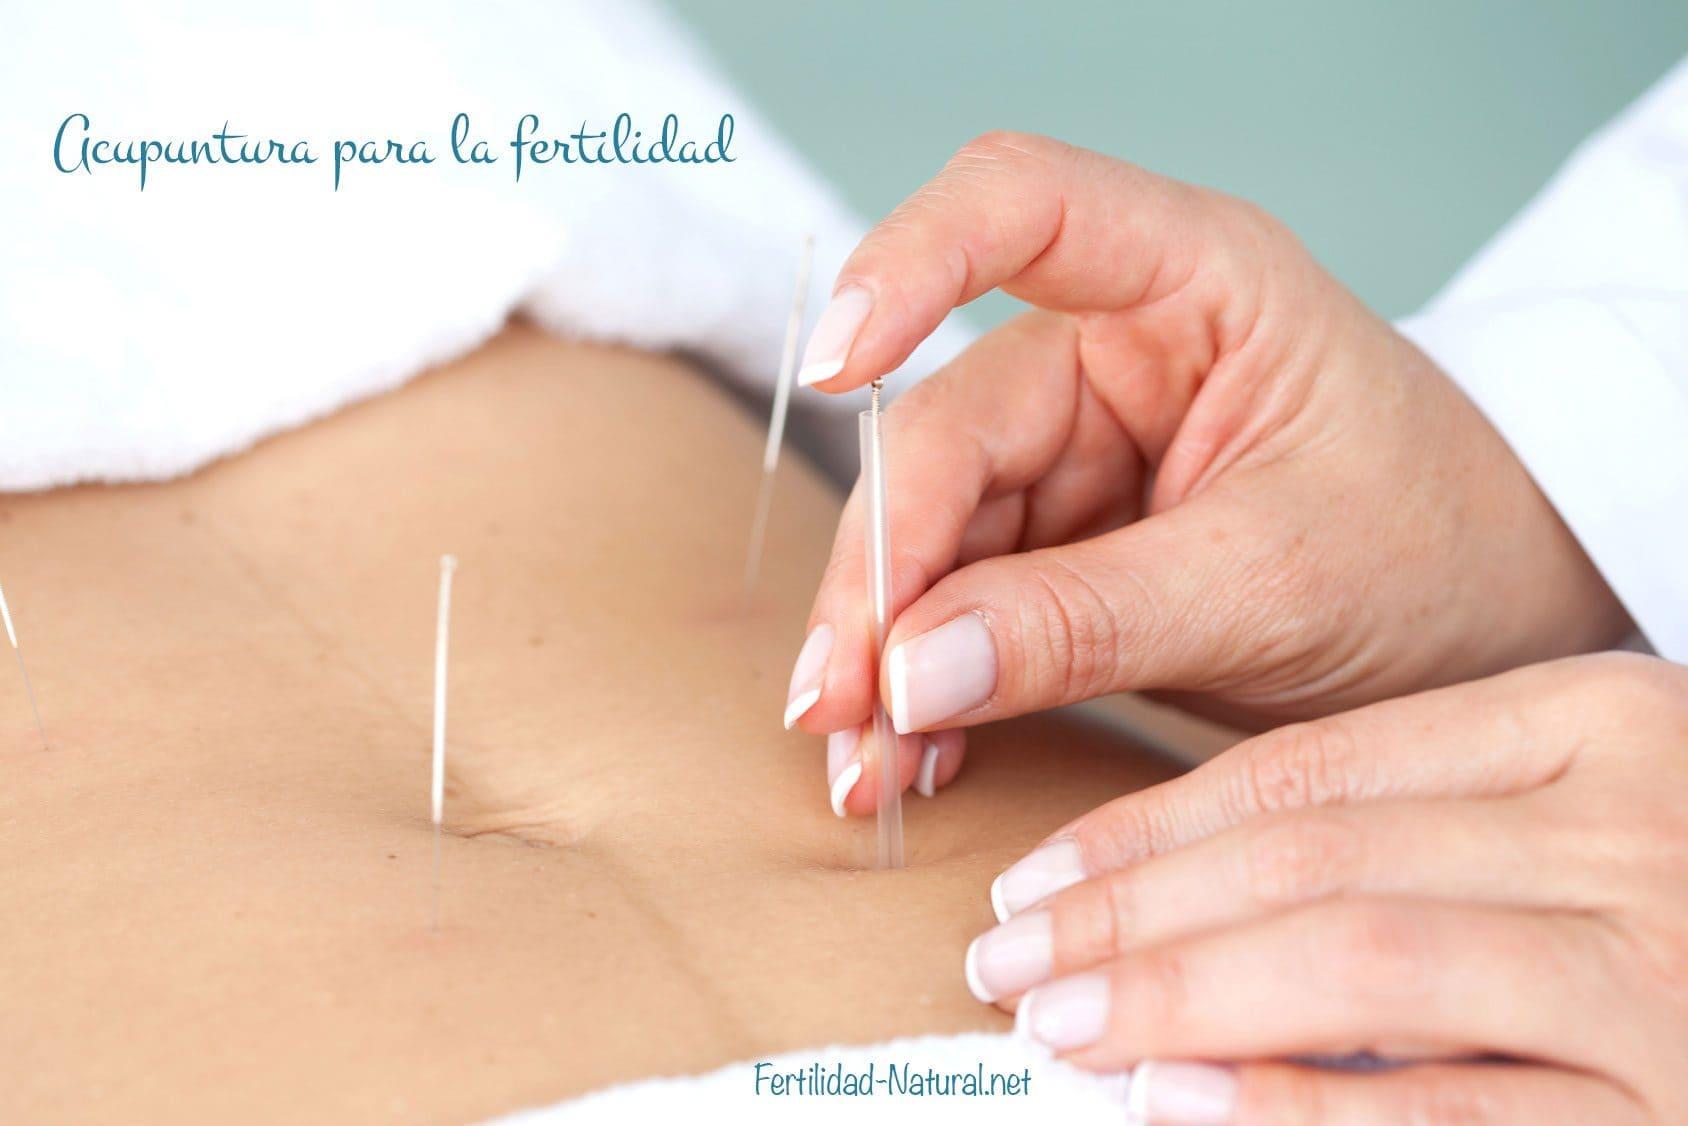 acupuntura fertilidad